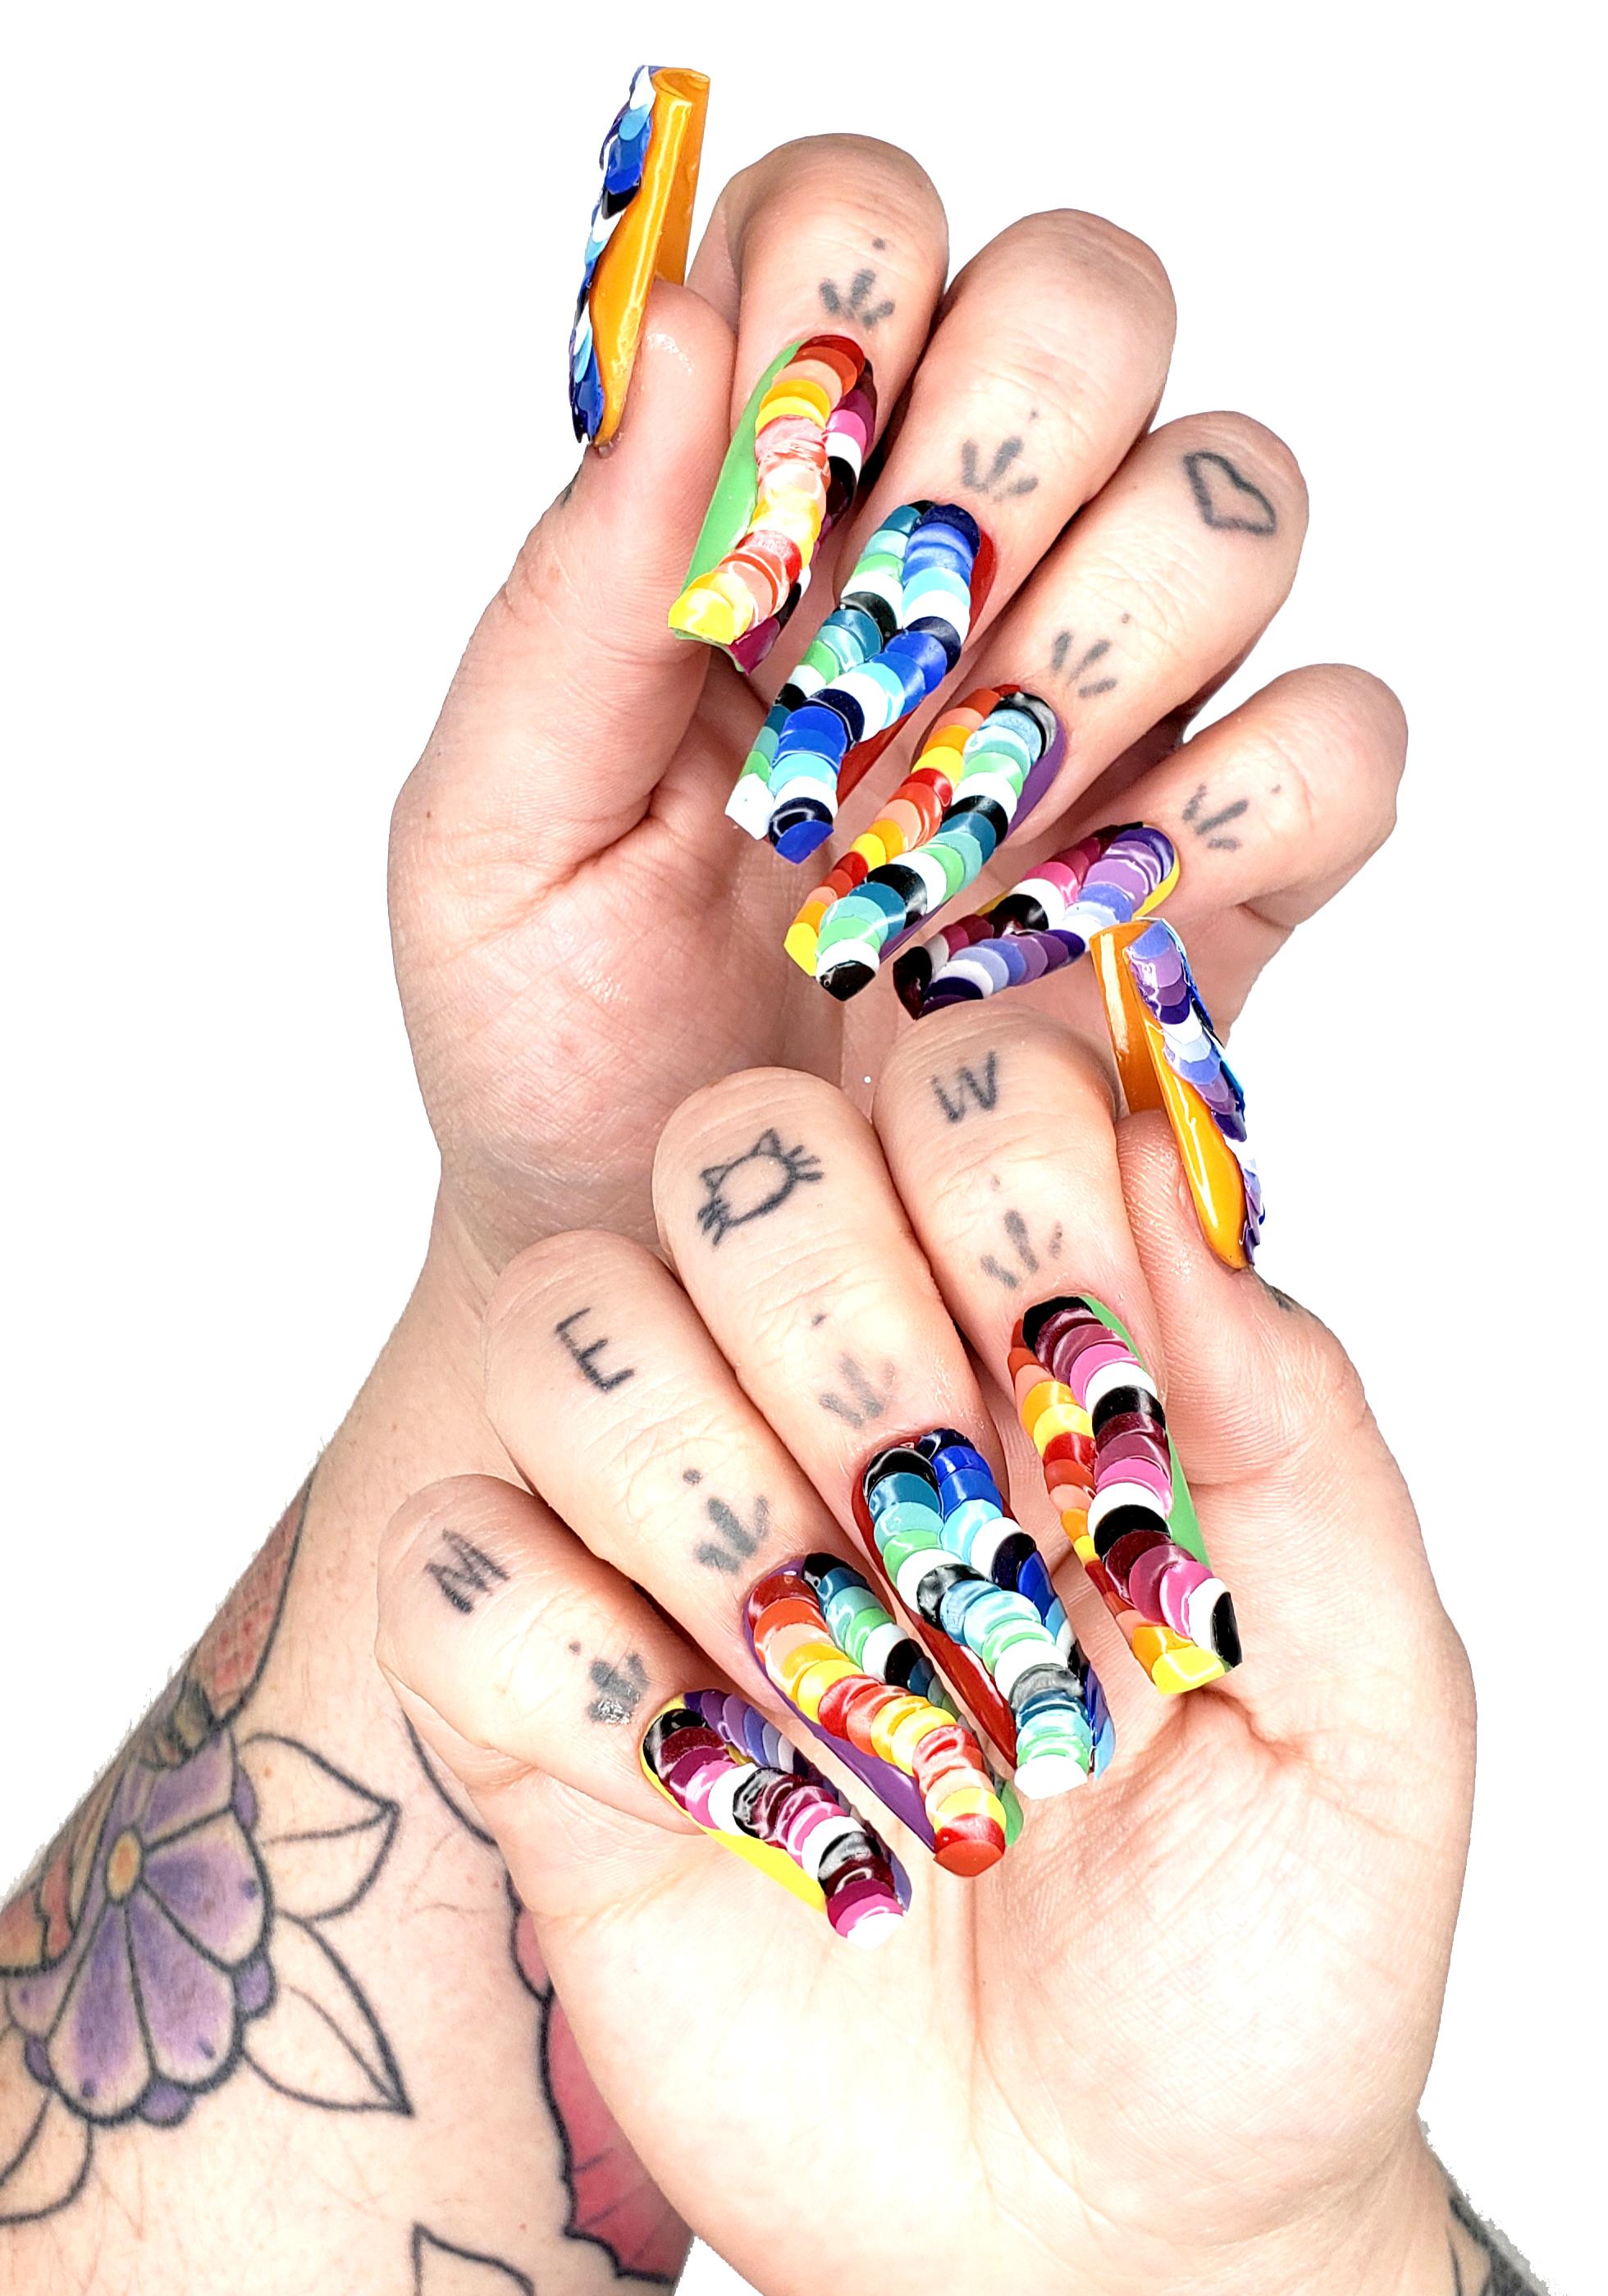 OPI NTNA Challenge 3: Rainbow Dotticure Nail Art (Emily)